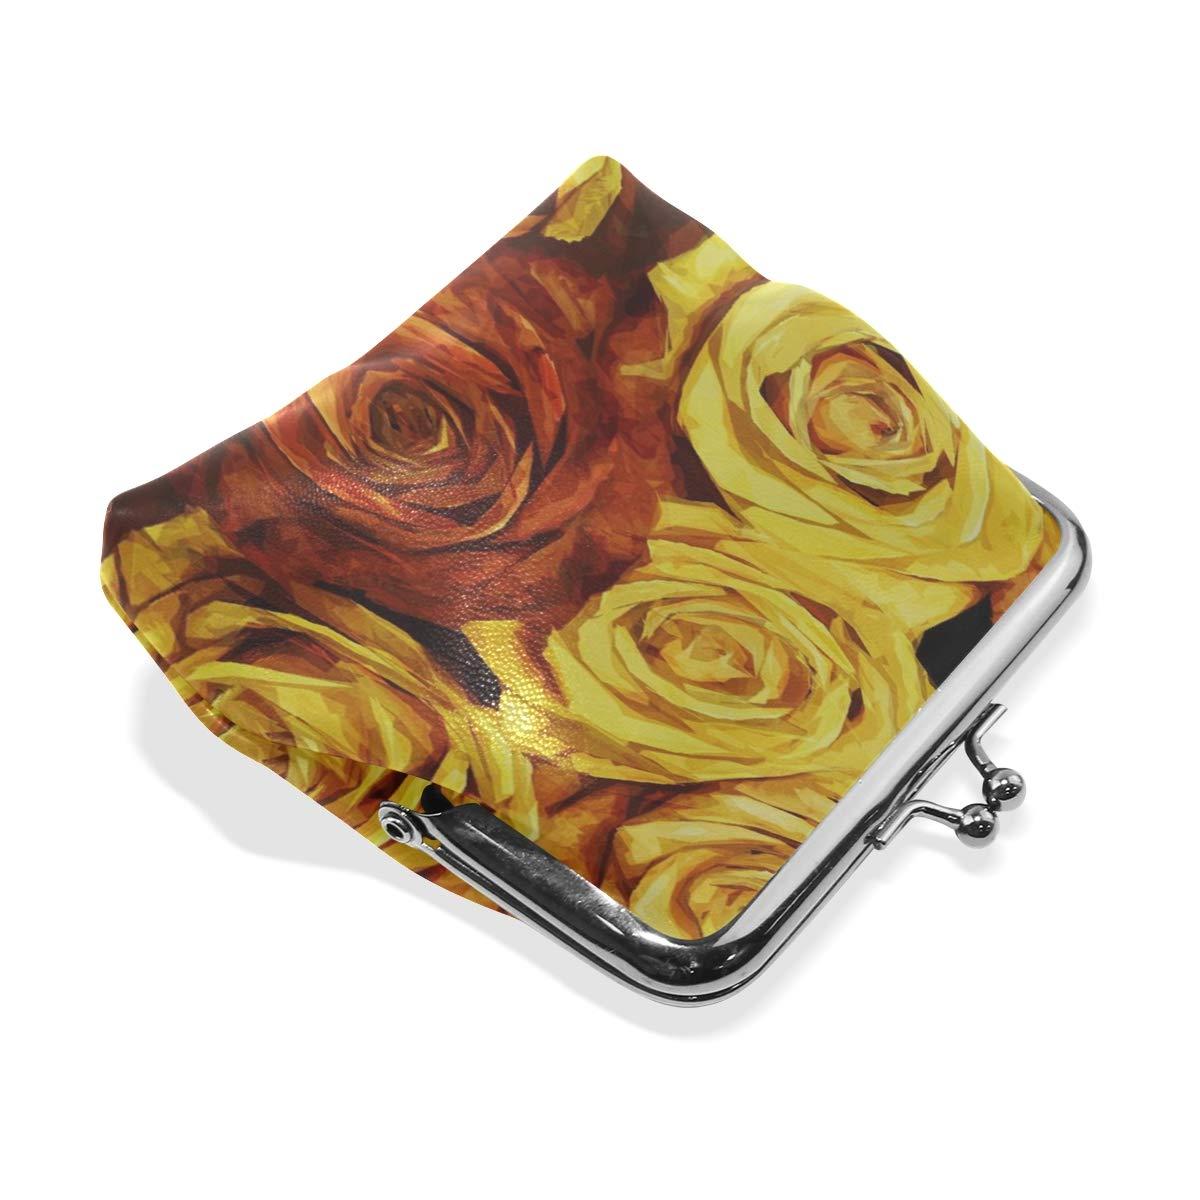 Rh Studio Coin Purse Clasp Closure Roses Painting Bloom Flower Design Print Wallet Exquisite Coin Pouch Girls Women Clutch Handbag Exquisite Gift